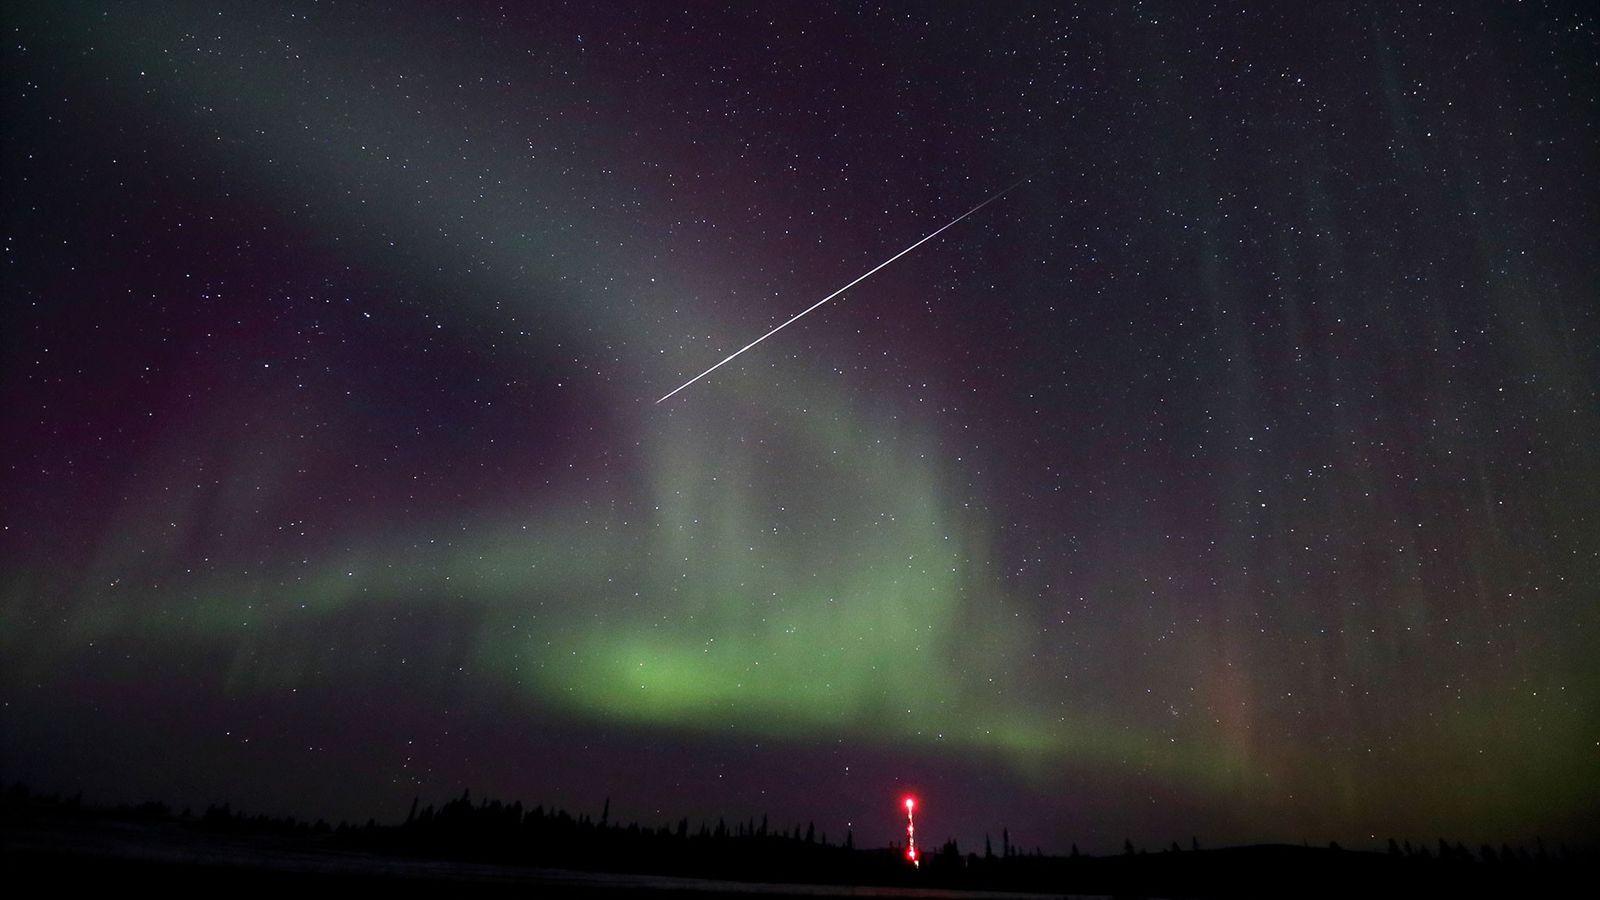 A shooting star cuts across auroras in a November night sky.